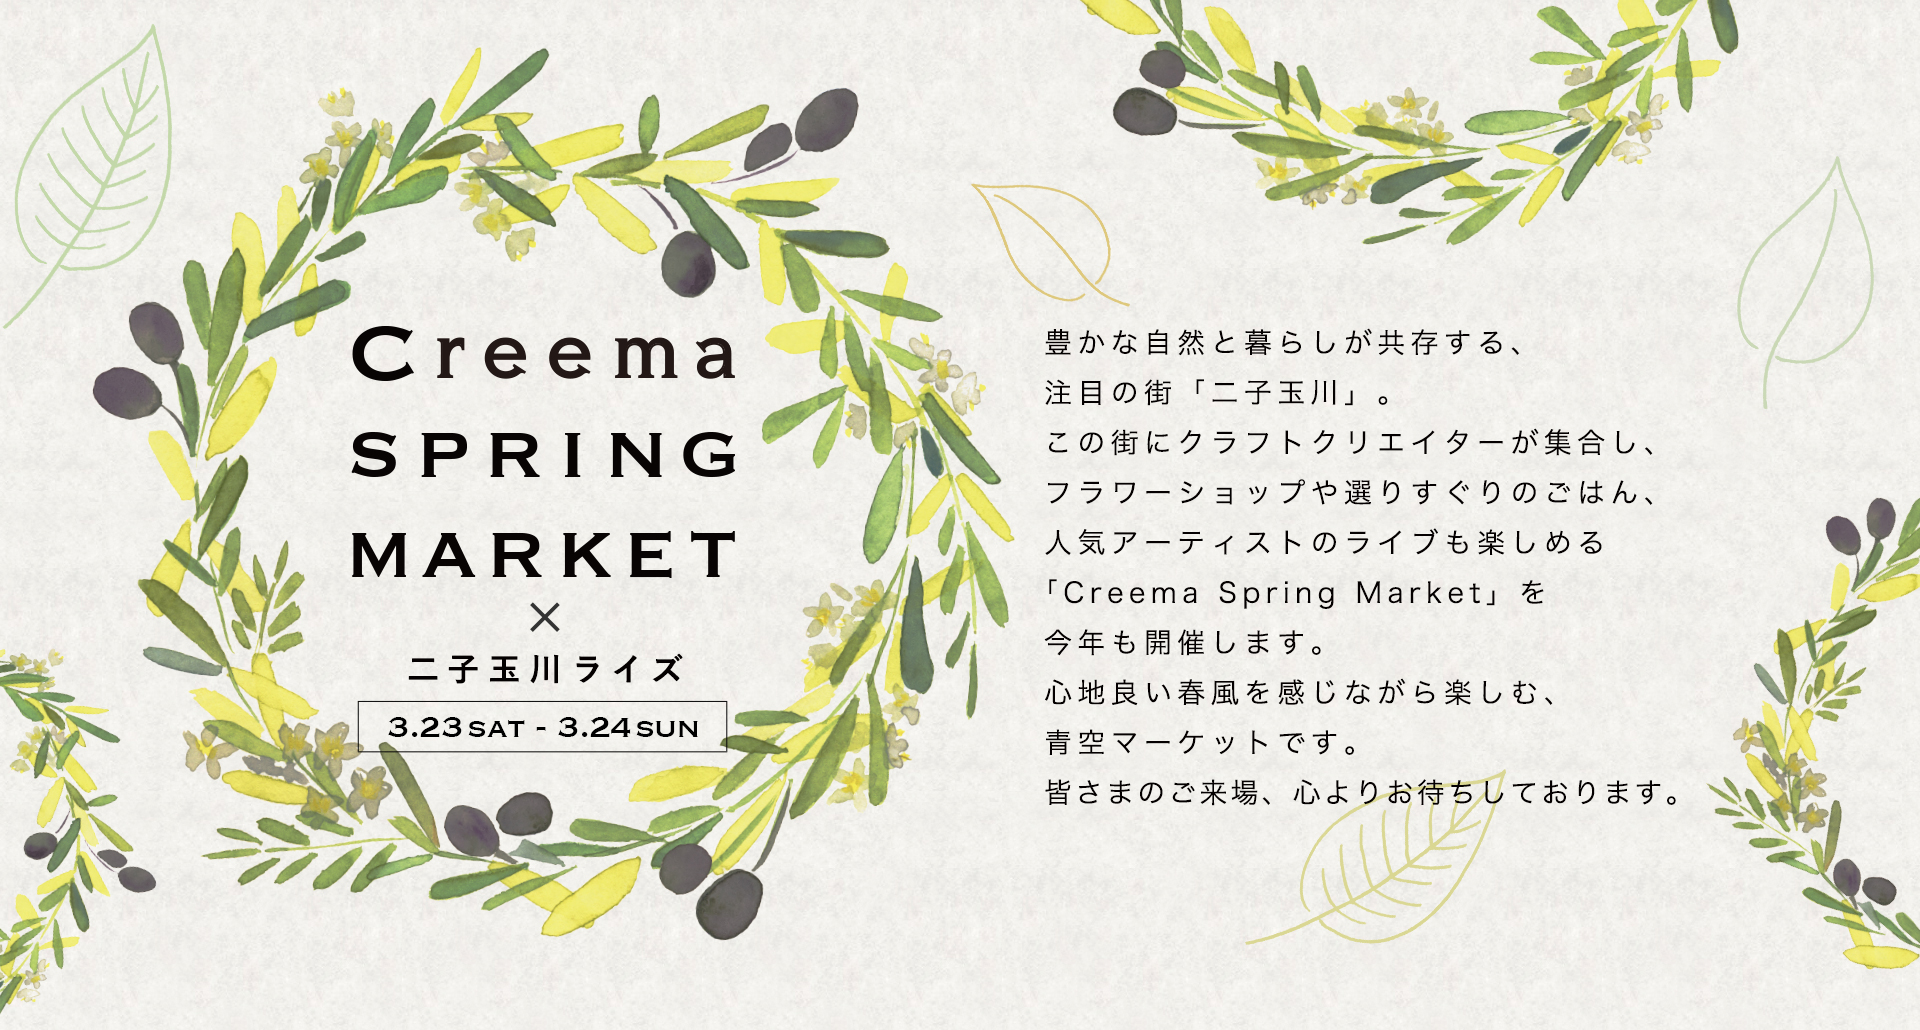 b30ede30a81 Creema SPRING MARKET Creema(クリーマ) ハンドメイド・手作り ...